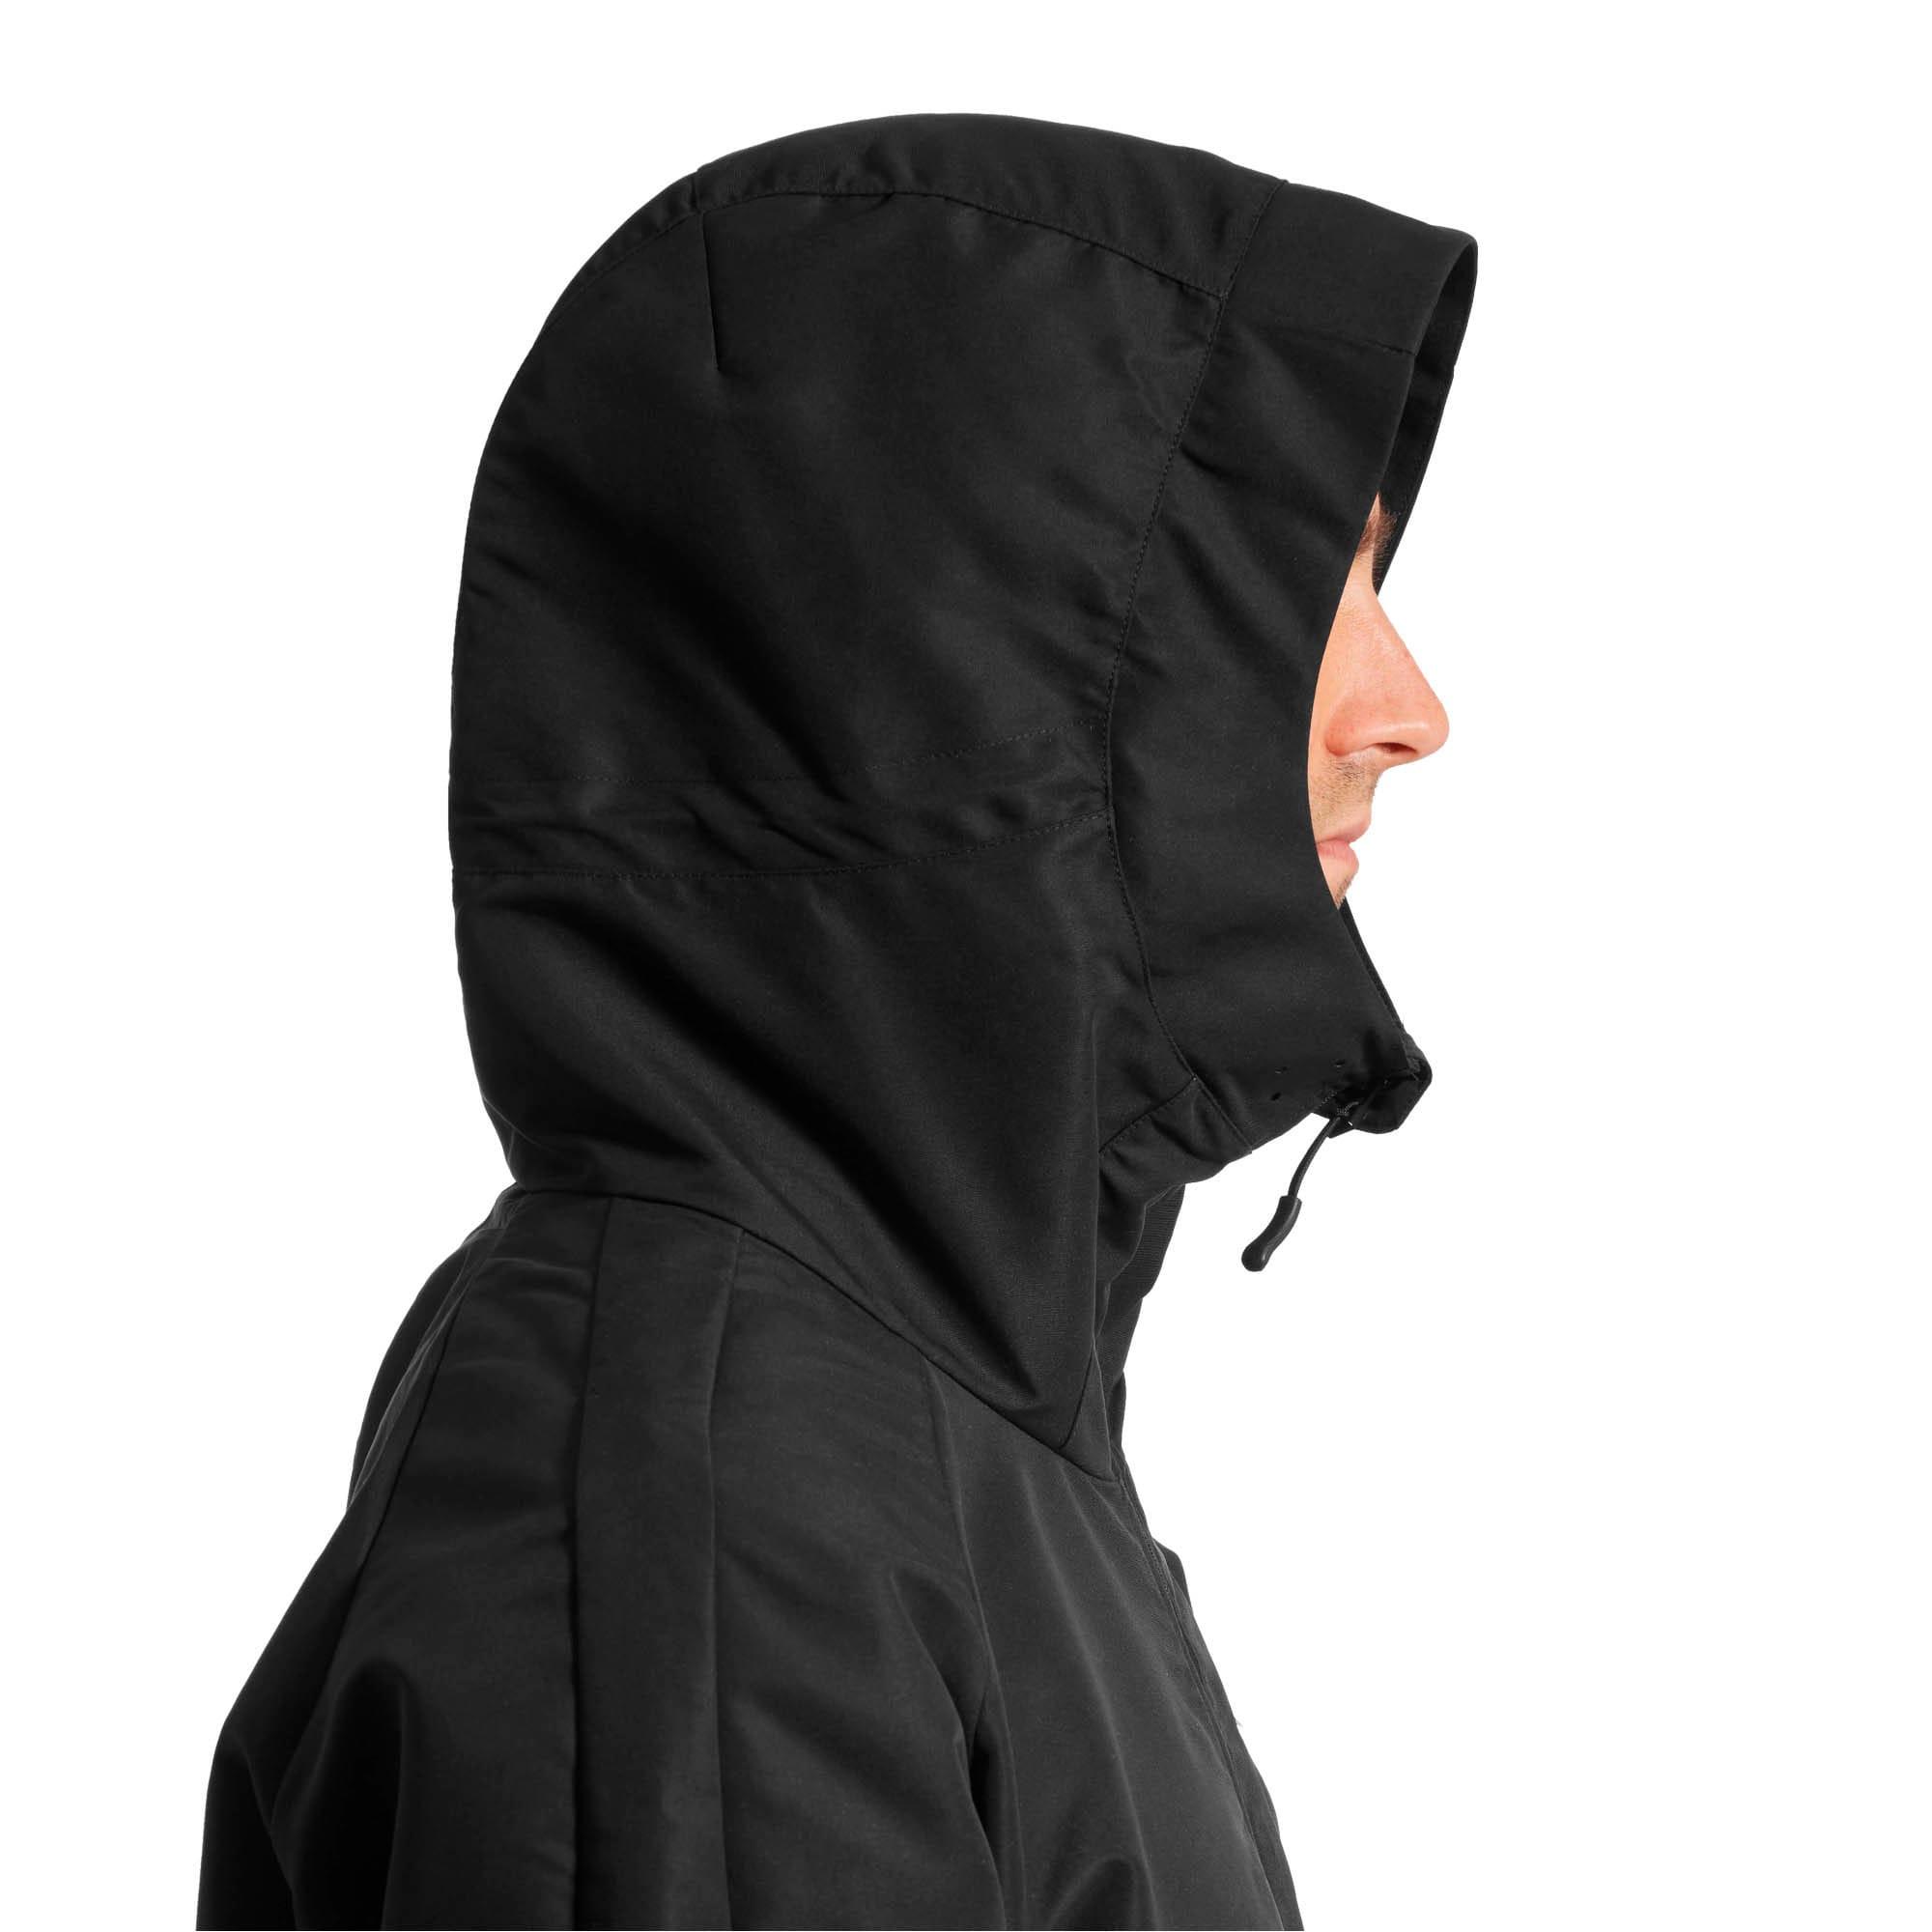 Thumbnail 4 of Mobility Men's Jacket, Puma Black, medium